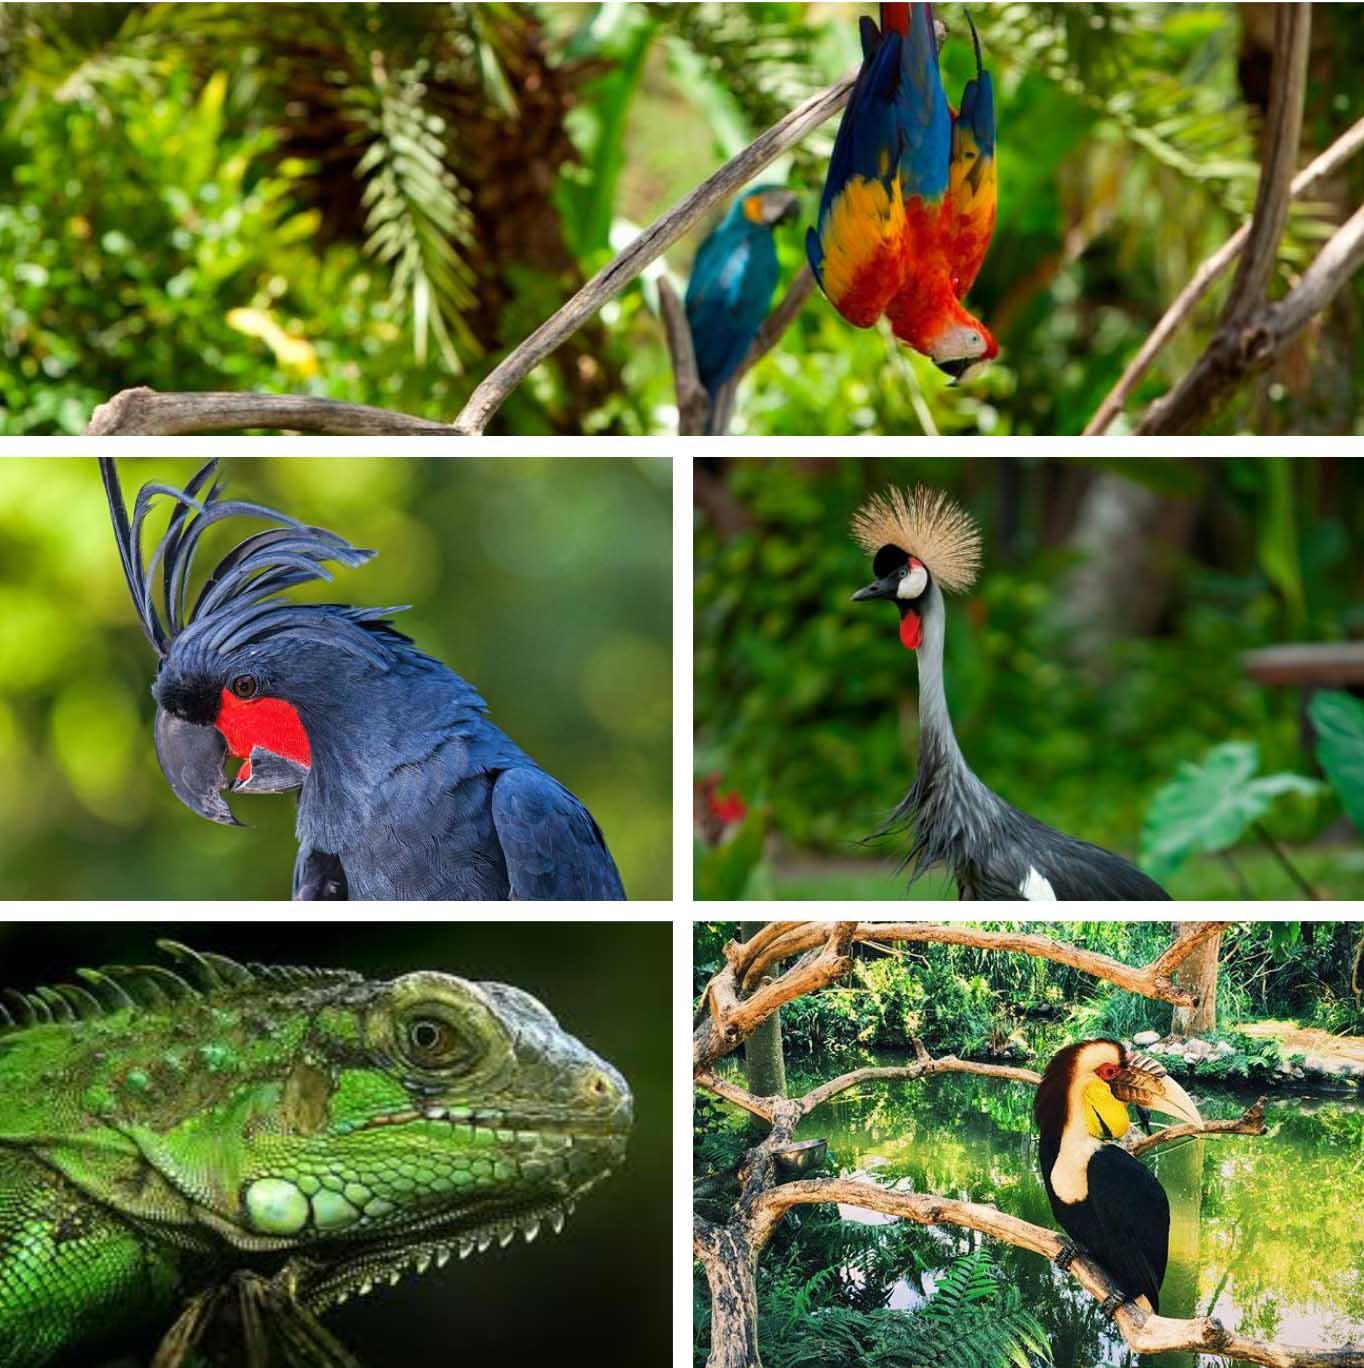 Bali Bird & Reptile Park - Bali's Wild Side - Animal Attractions